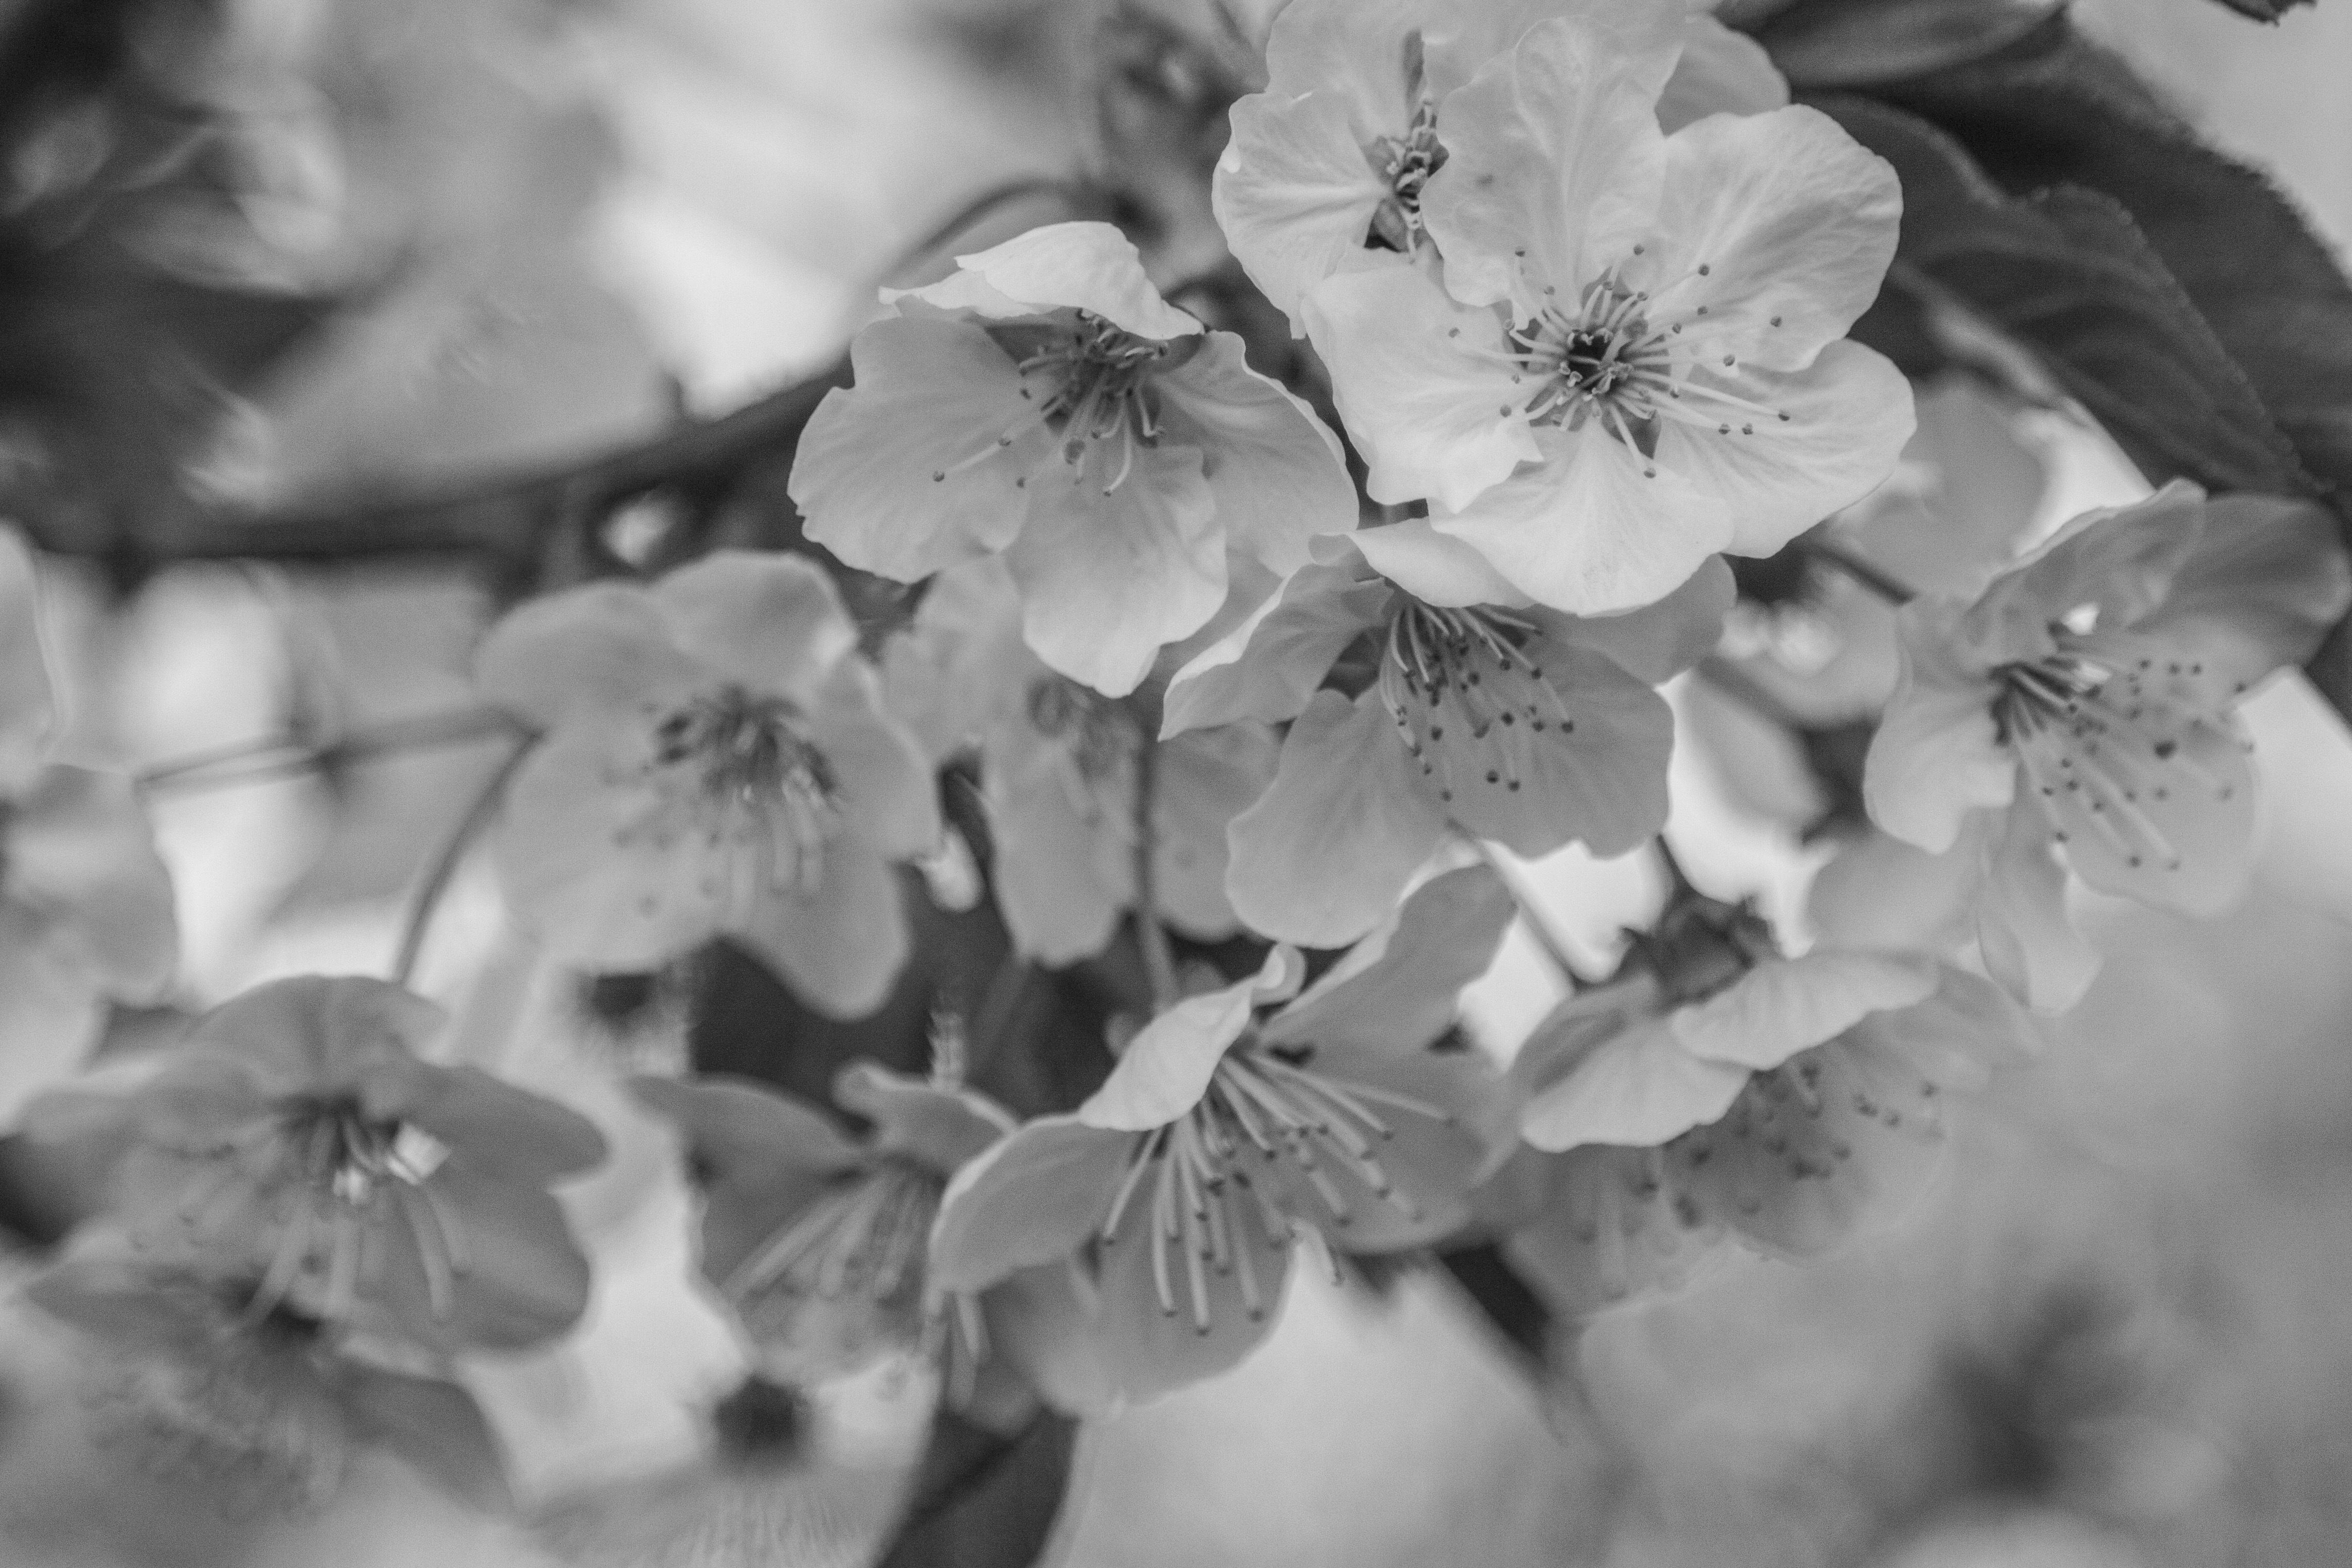 Download 600 Koleksi Gambar Bunga Sakura Hitam Putih HD Paling Keren